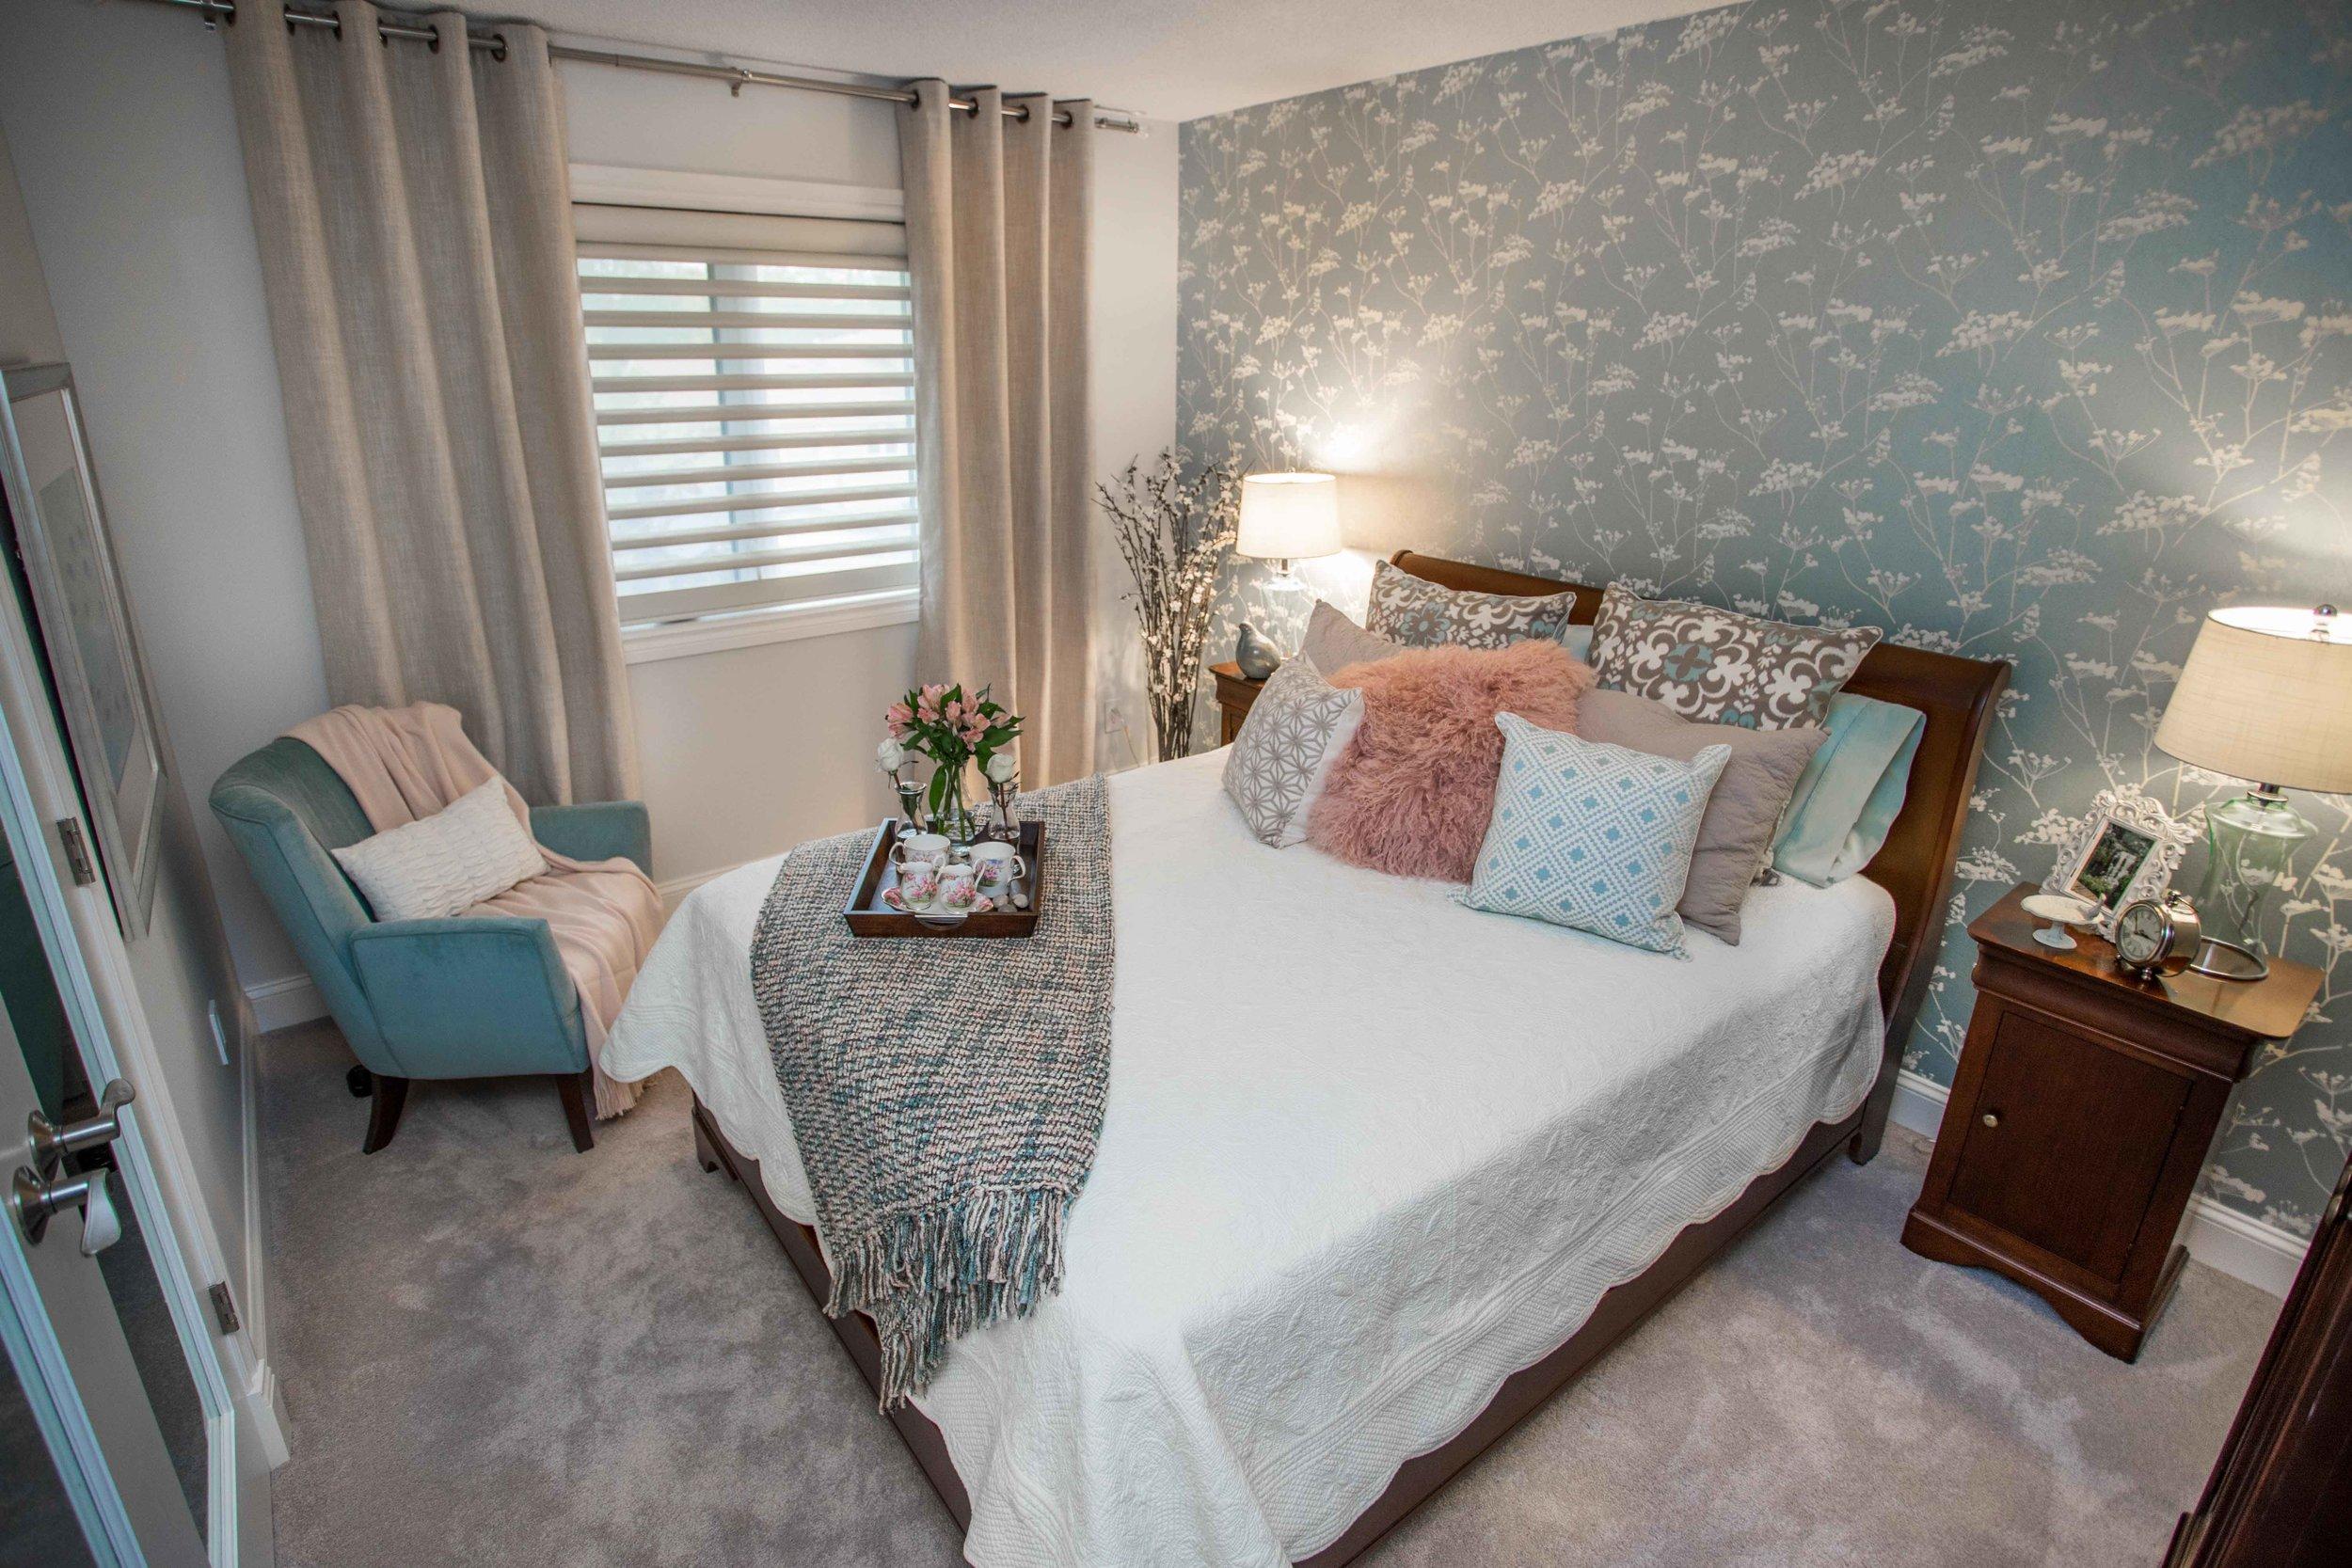 Picturesk-RL-Appelquist Bedrooms-2.jpg